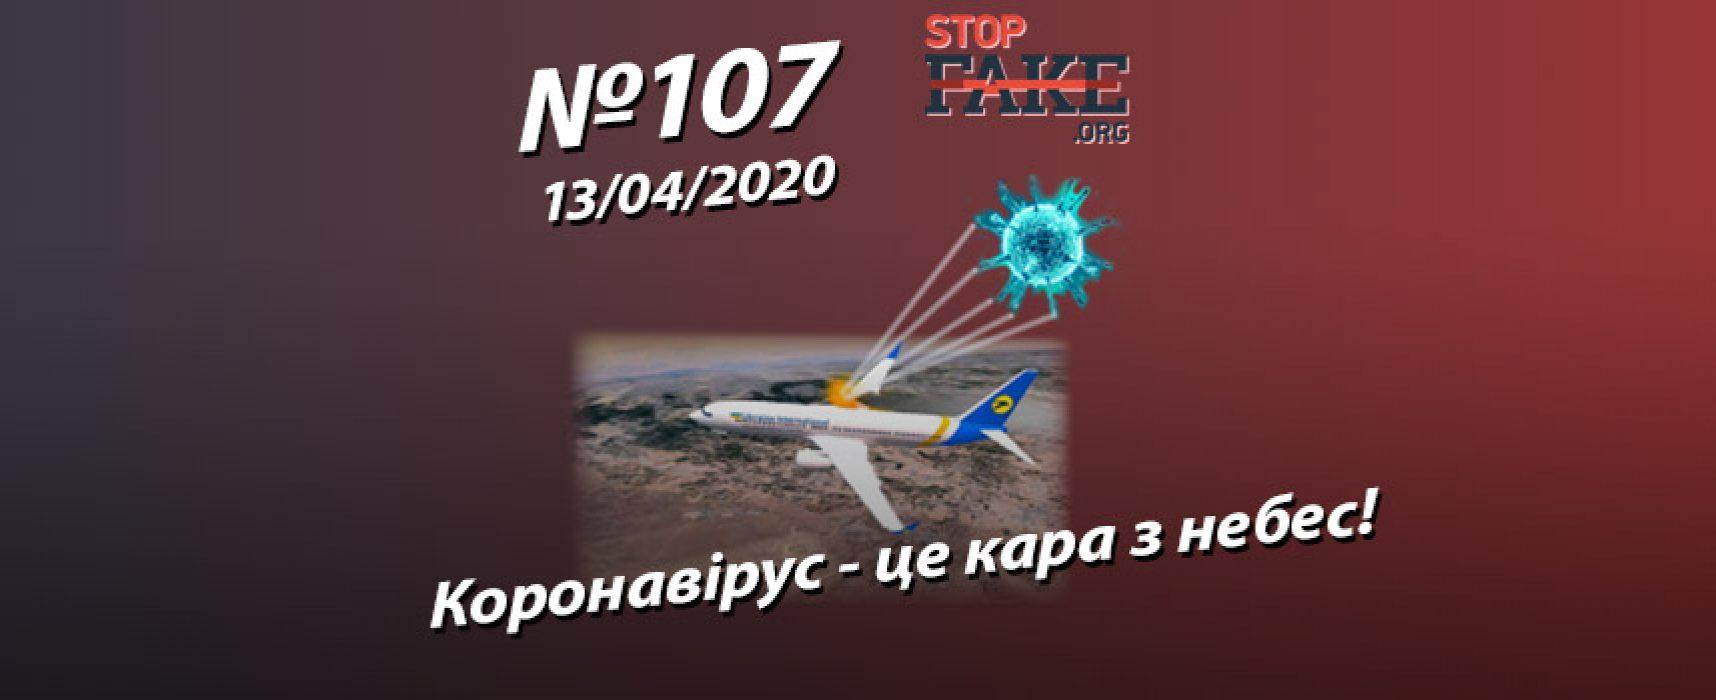 Коронавірус – це кара з небес! – StopFake.org